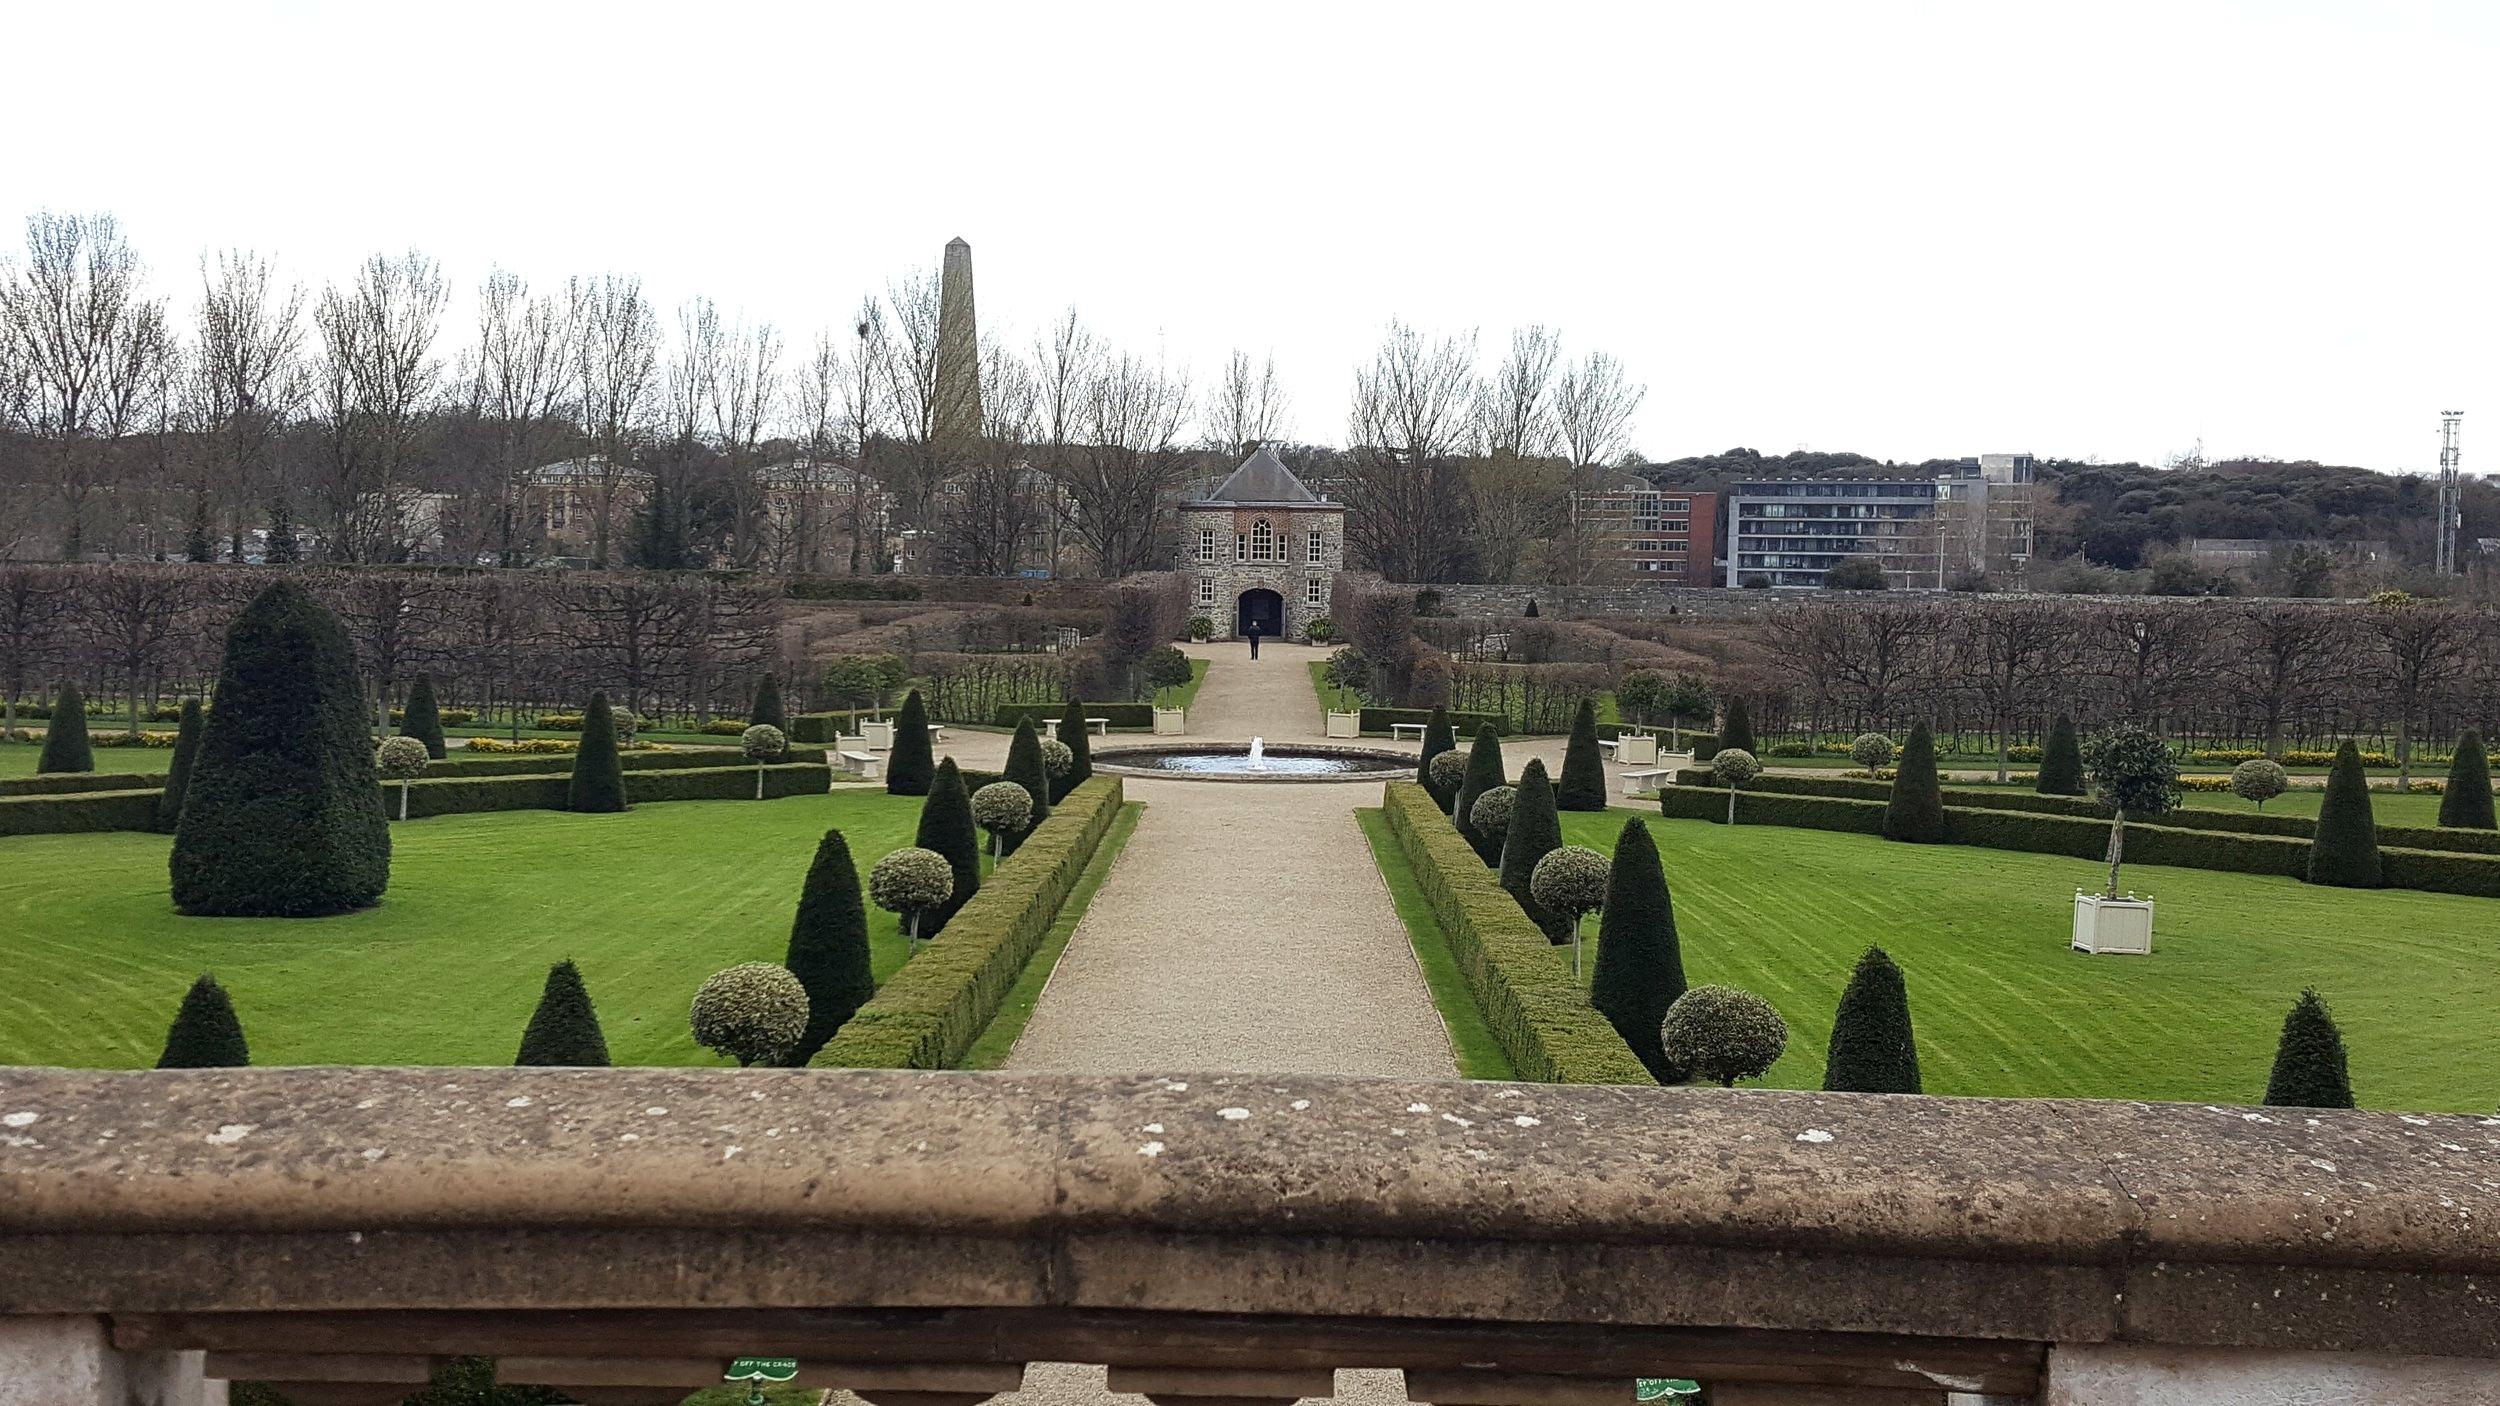 IMMA Gardens